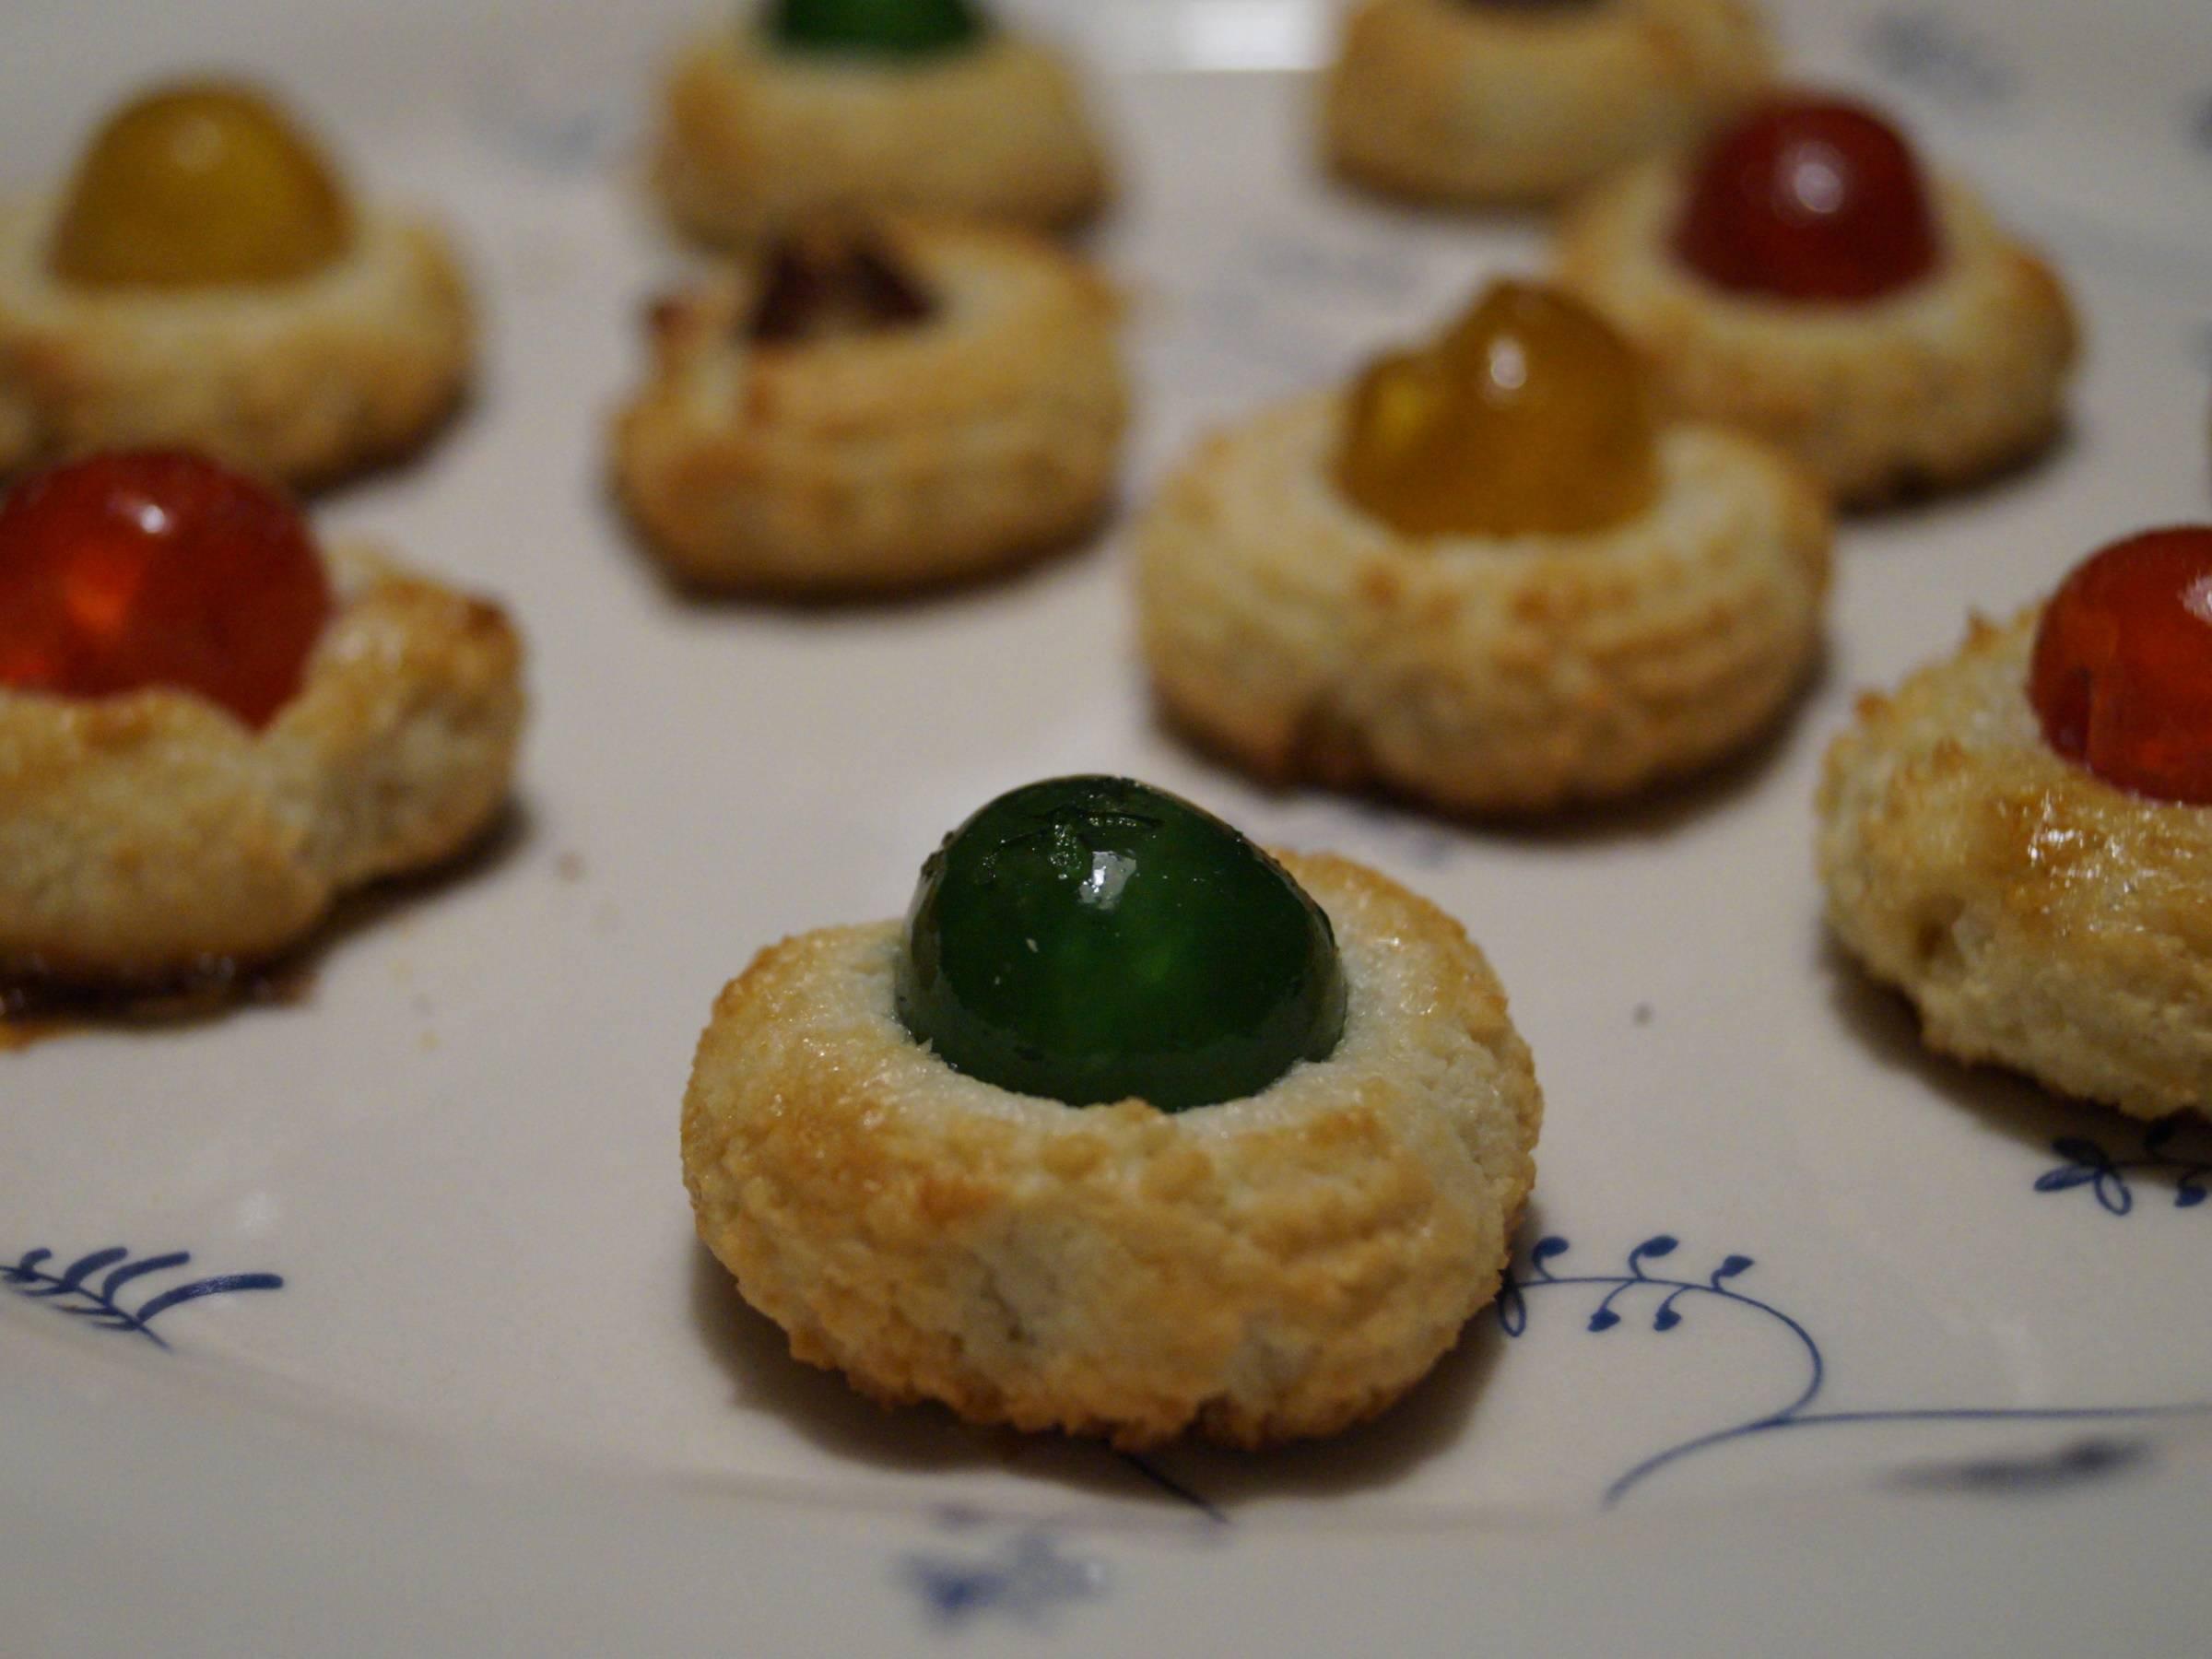 Kransekagekonfekt med grønt cocktailbær